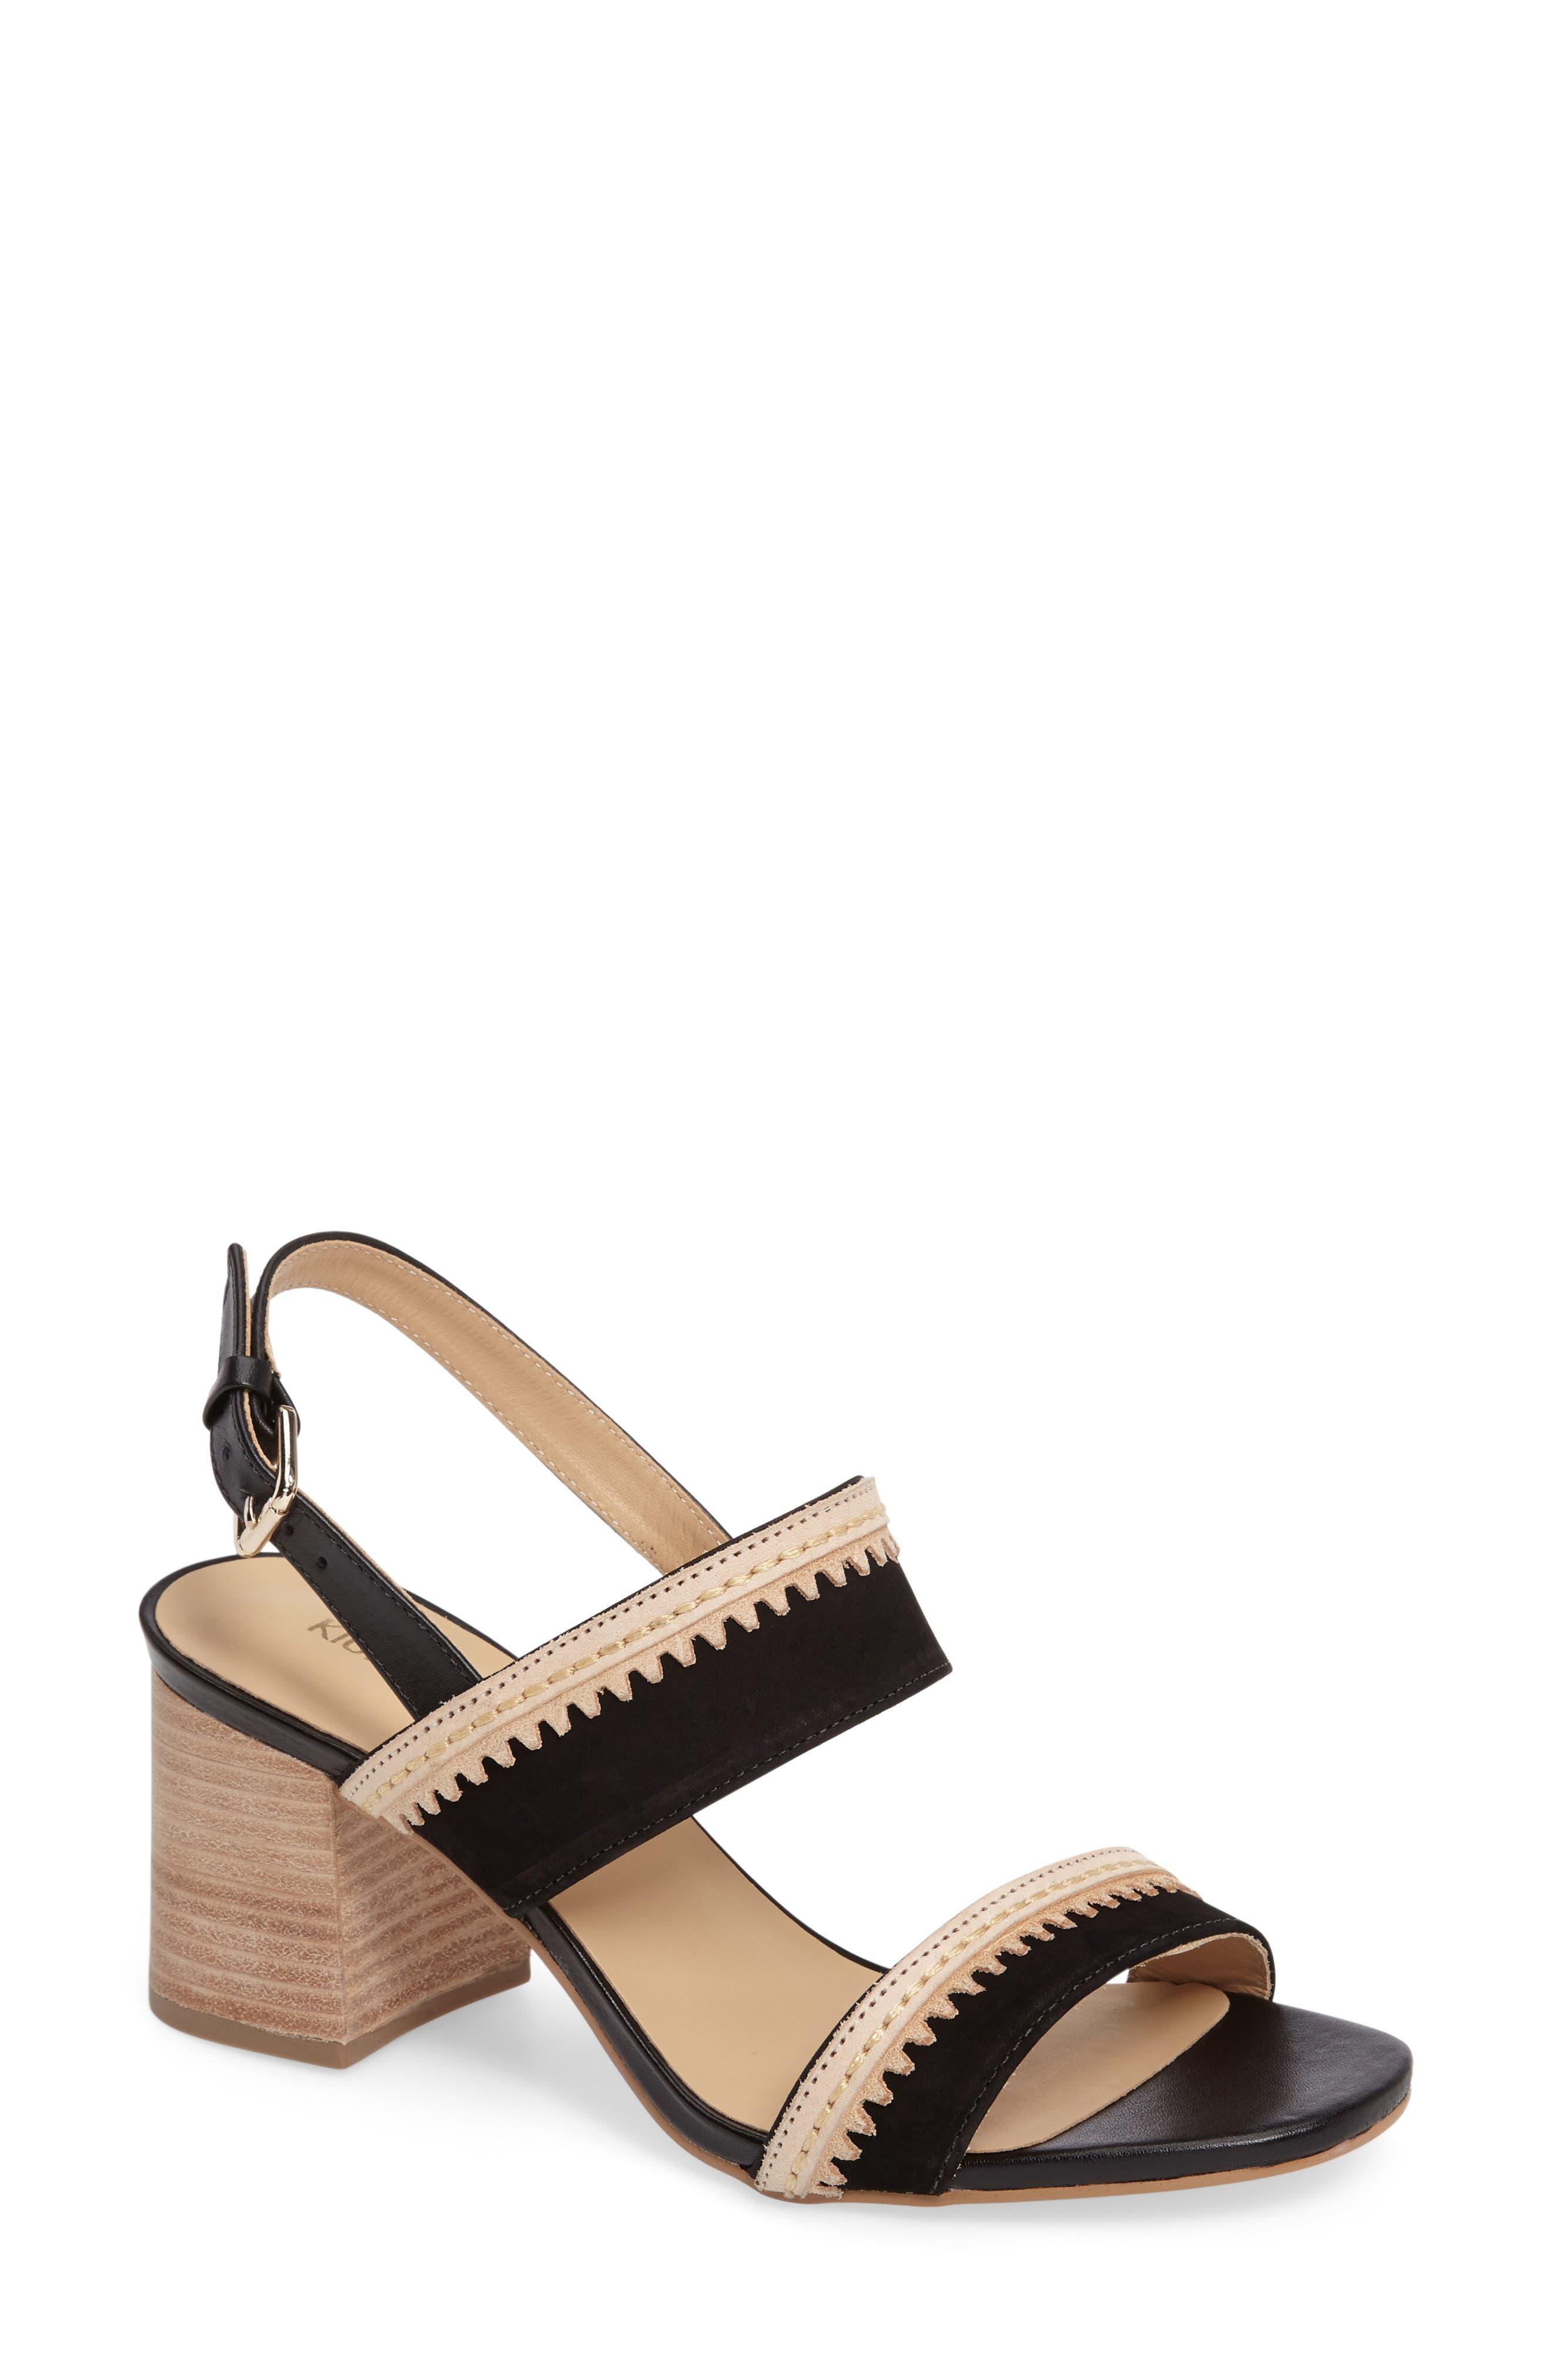 Rycca Block Heel Sandal,                             Main thumbnail 1, color,